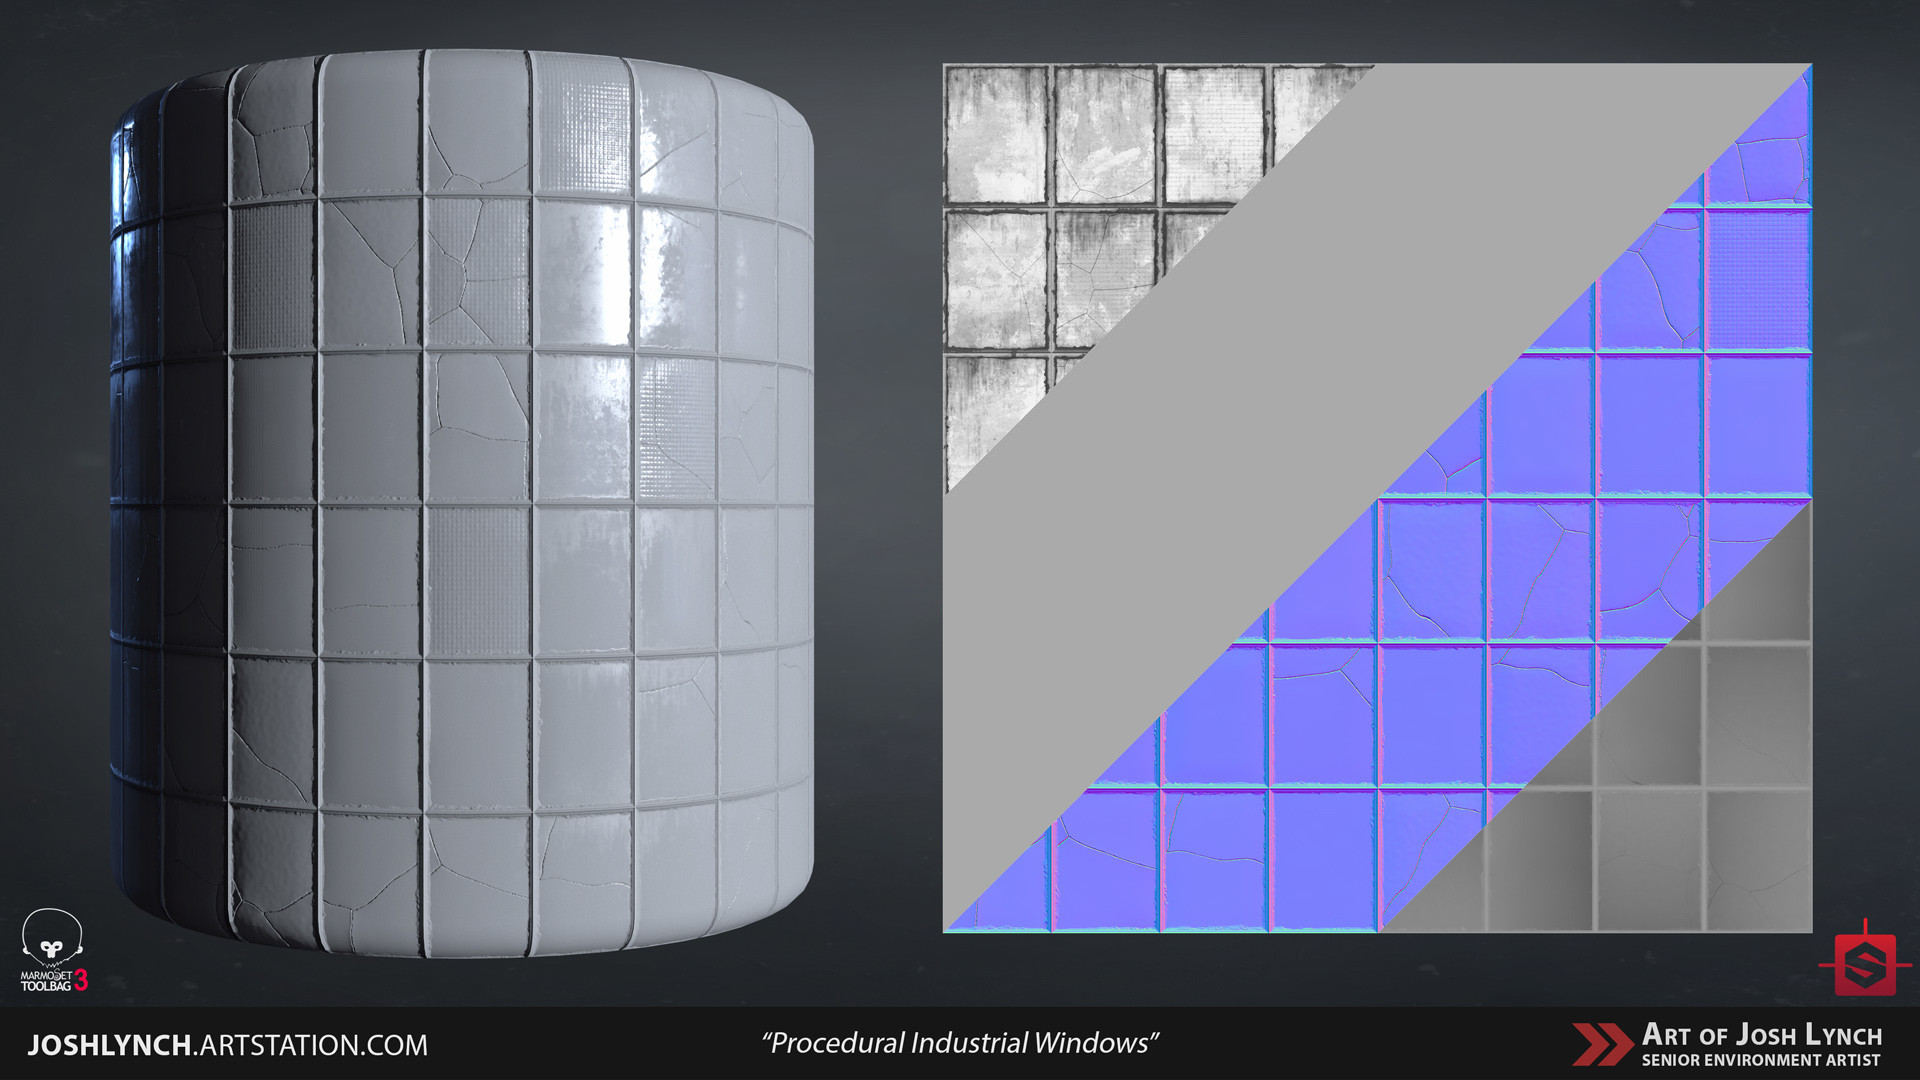 Joshua lynch industrial windows 01 layout comp gray